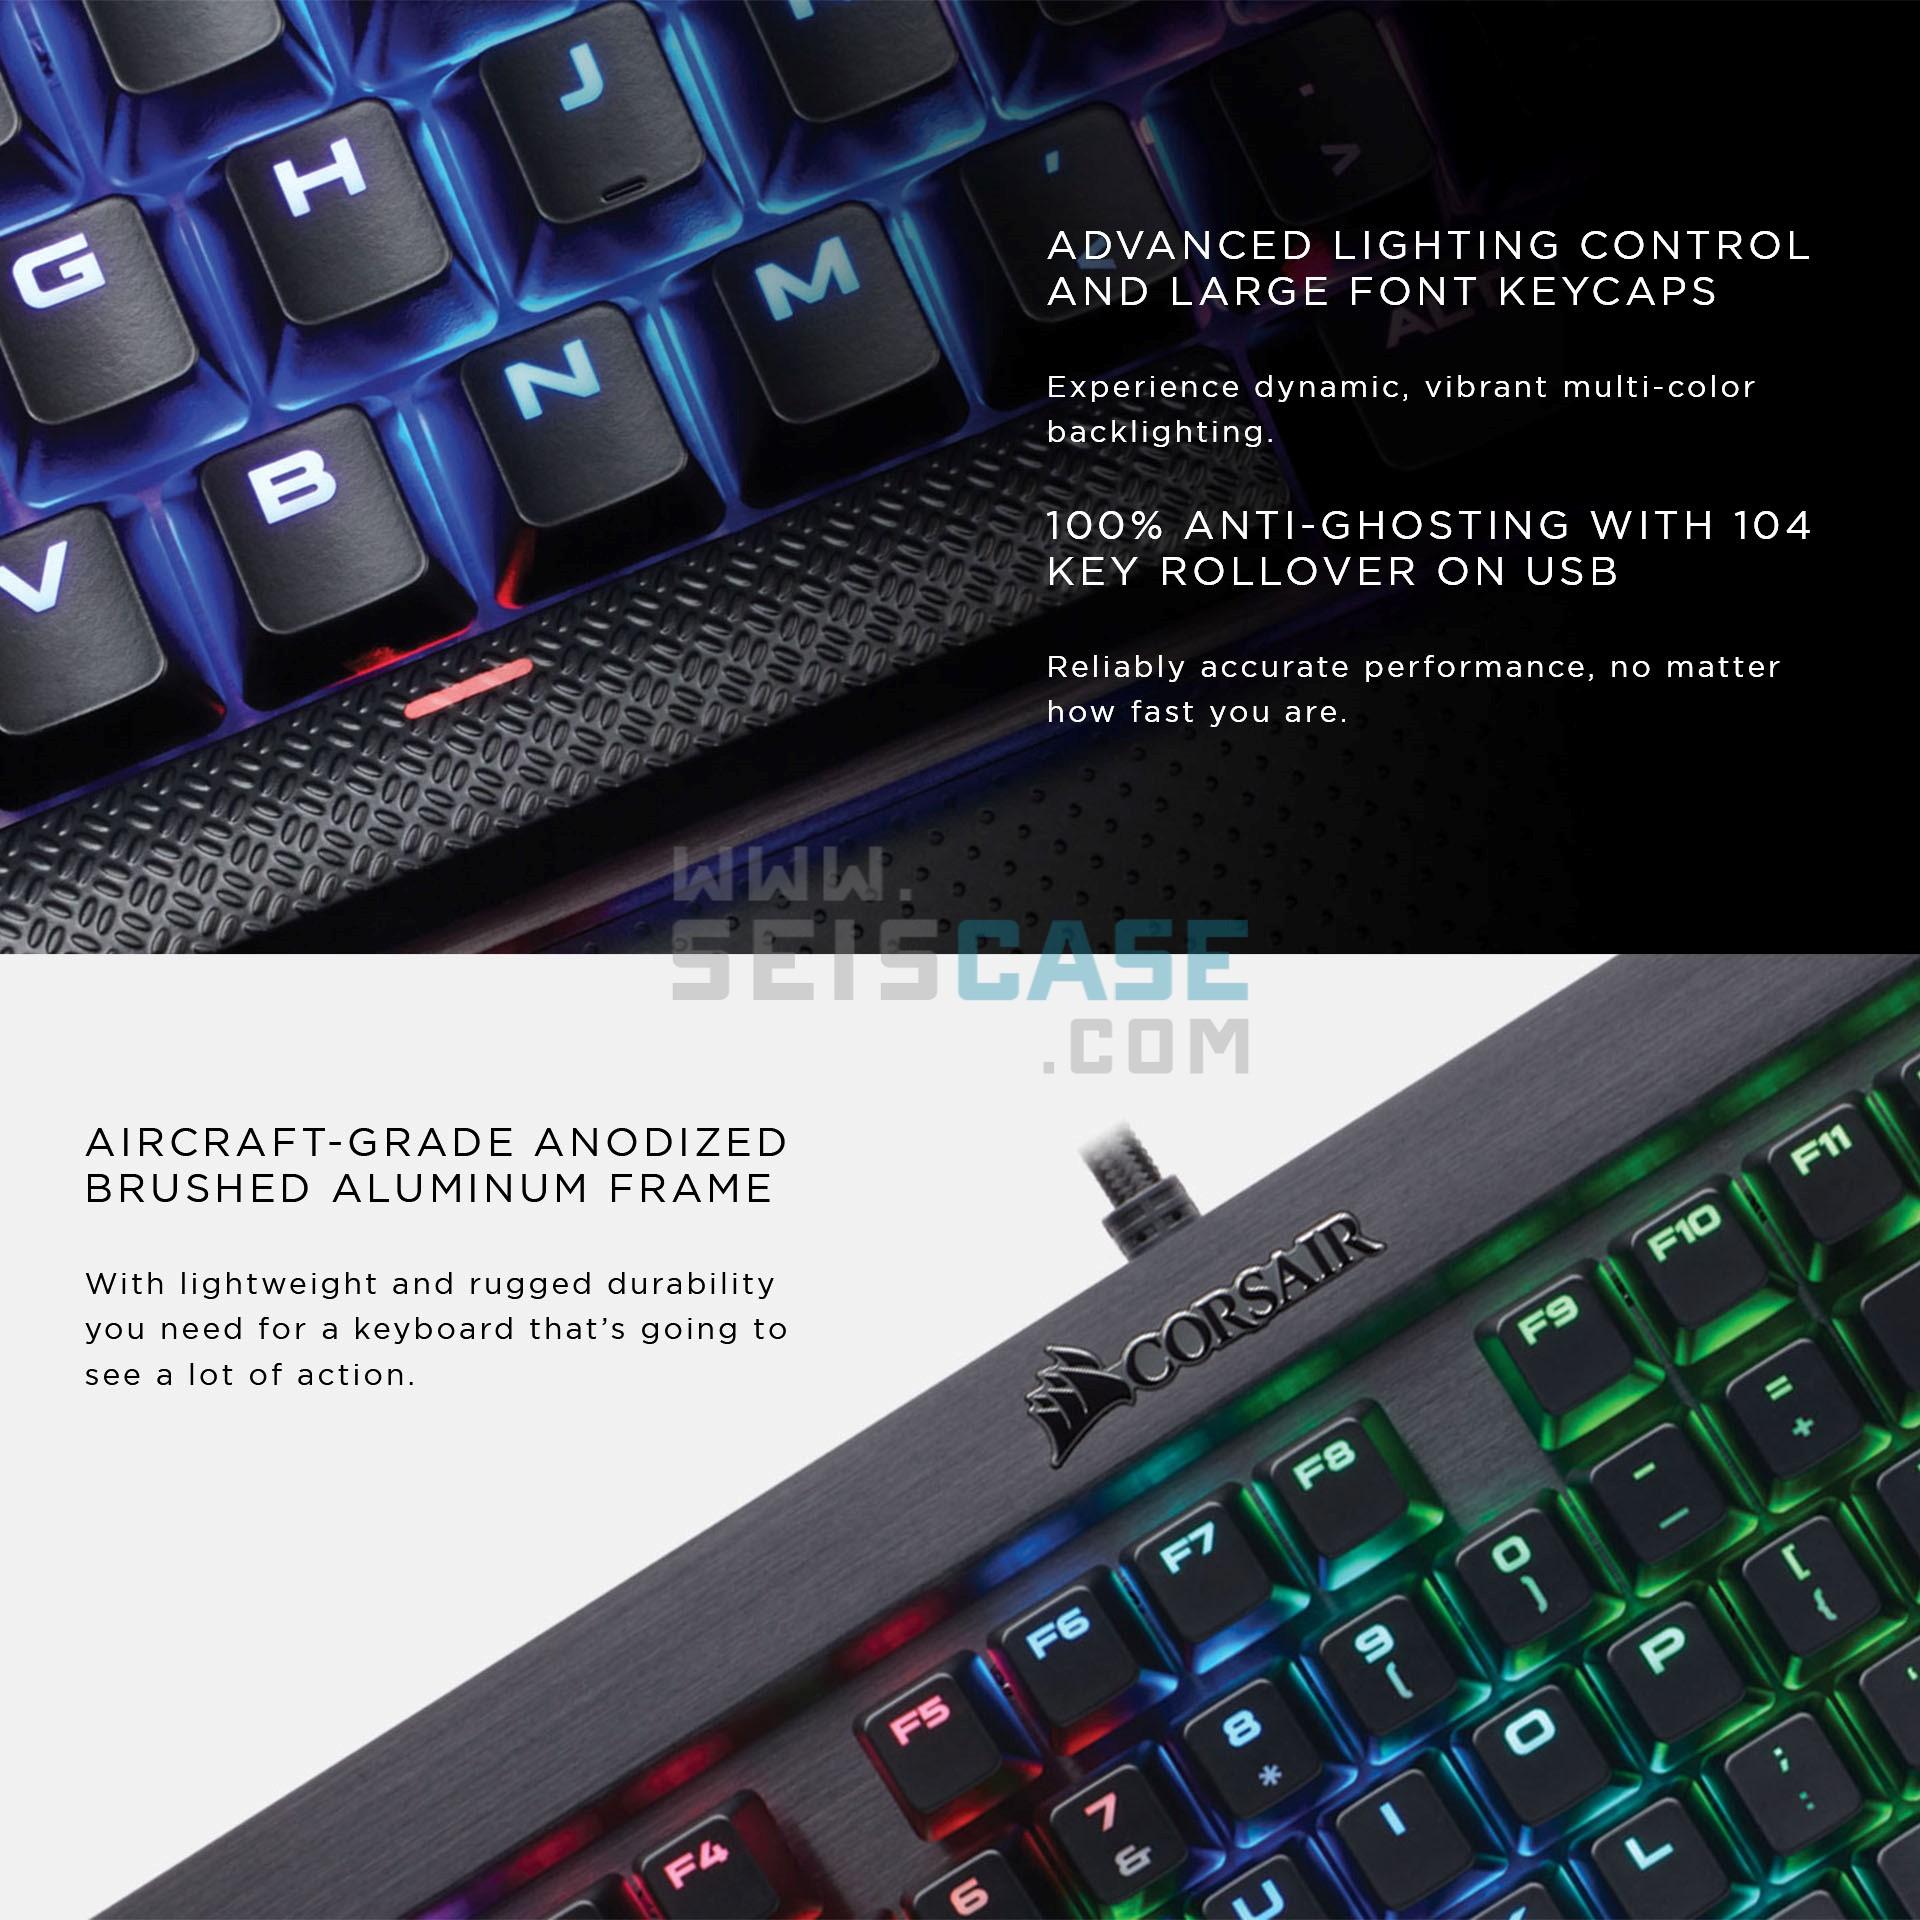 CORSAIR K70 RGB LUX Mechanical Gaming Keyboard Cherry MX Blue Silent